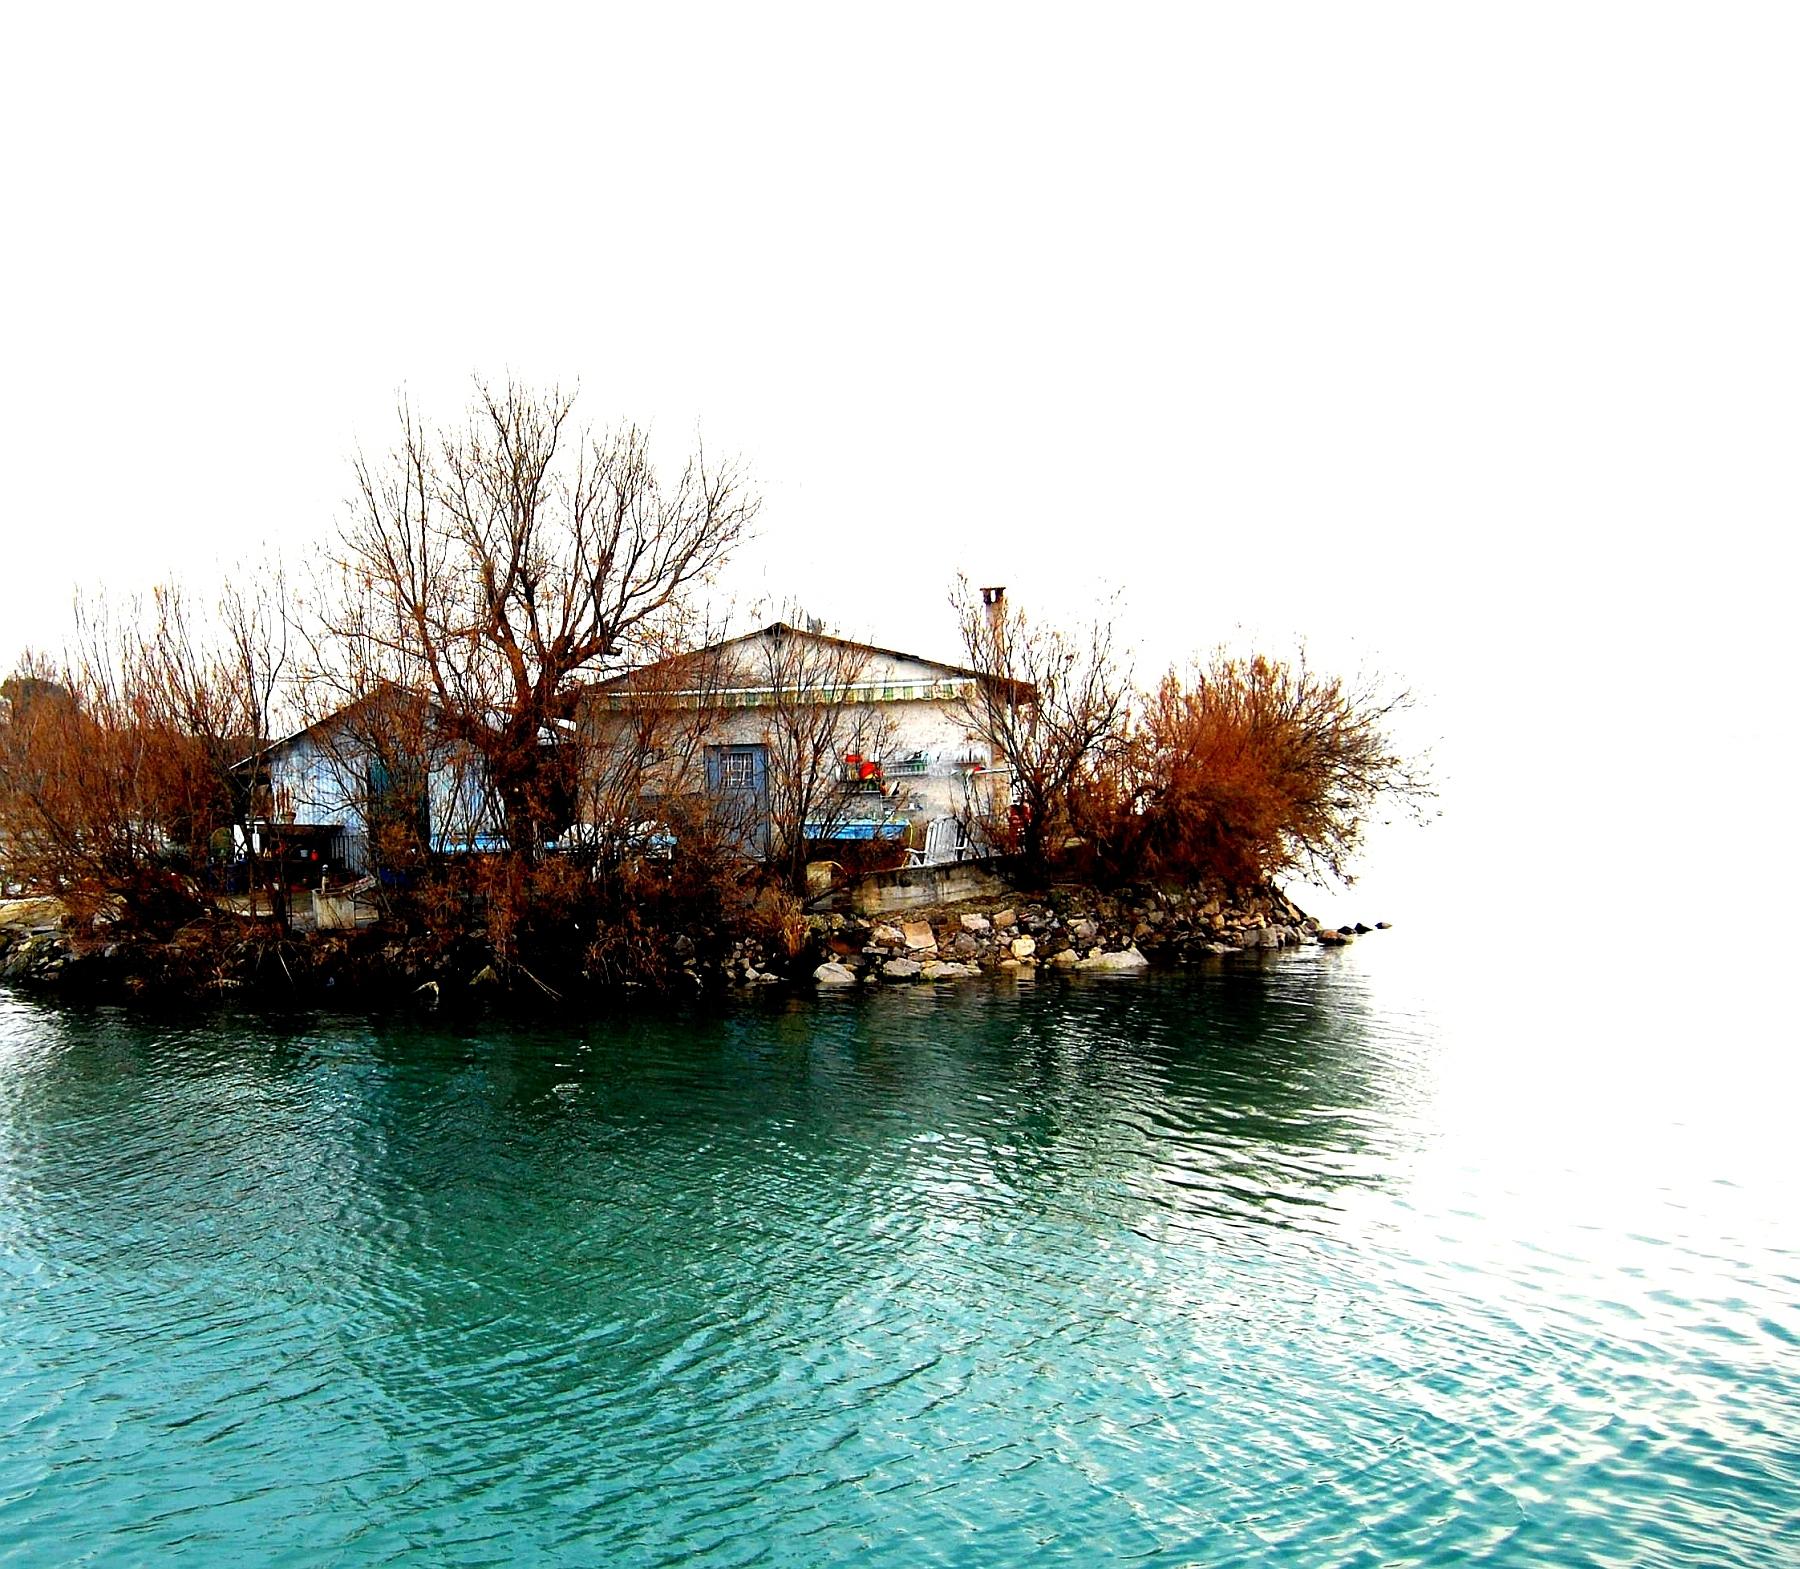 laguna; mestieri d'un tempo; Grado; laguna; documentario laguna di Grado; Lagune von Grado; lagoon; Friuli Venezia Giulia;